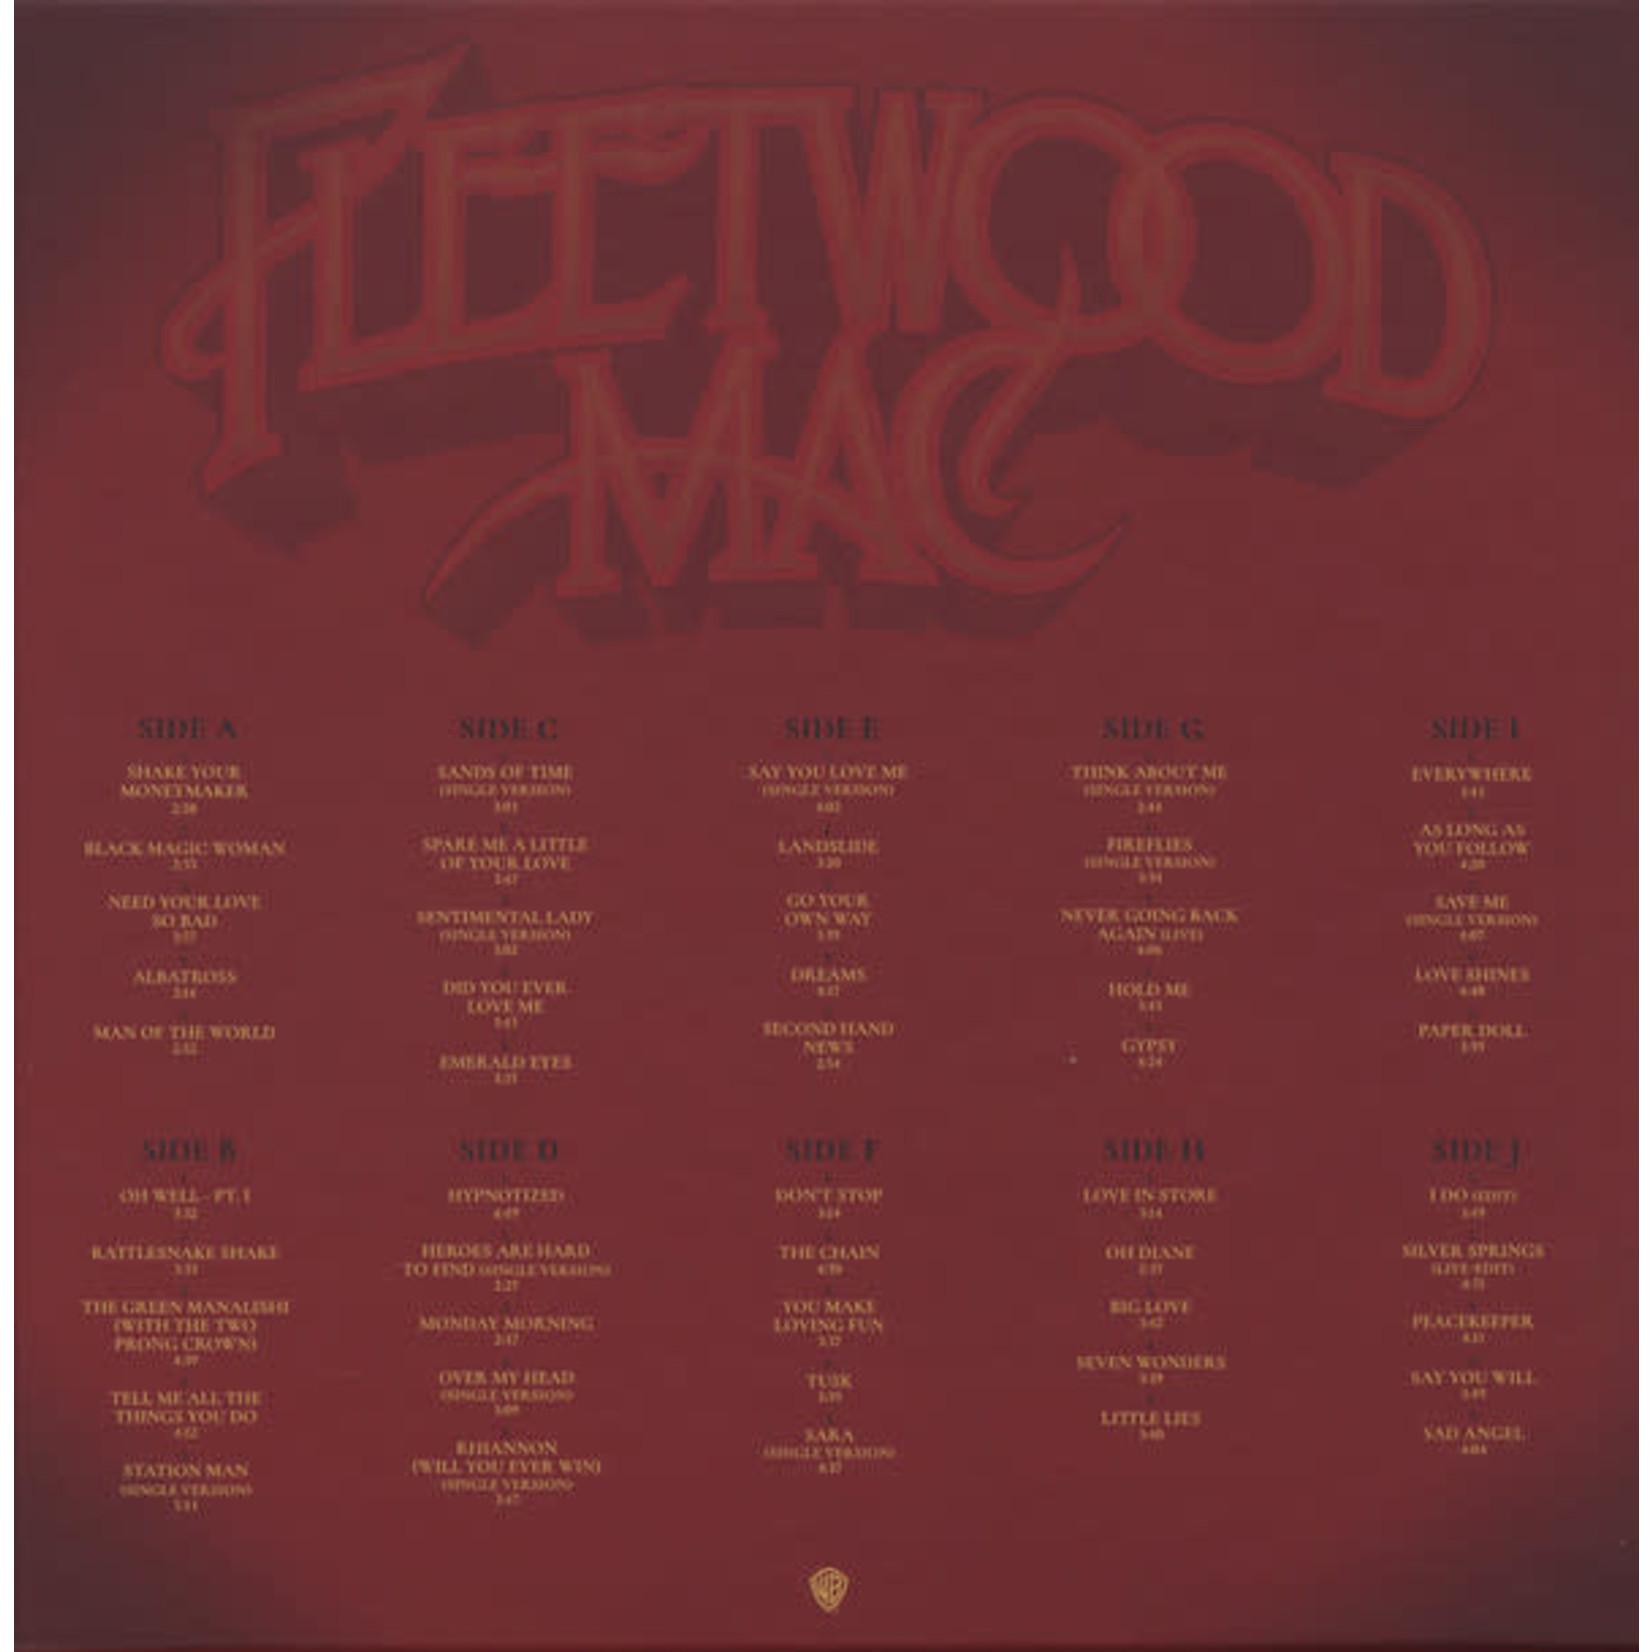 FLEETWOOD MAC 50 YEARS – DON'T STOP (5 LP)